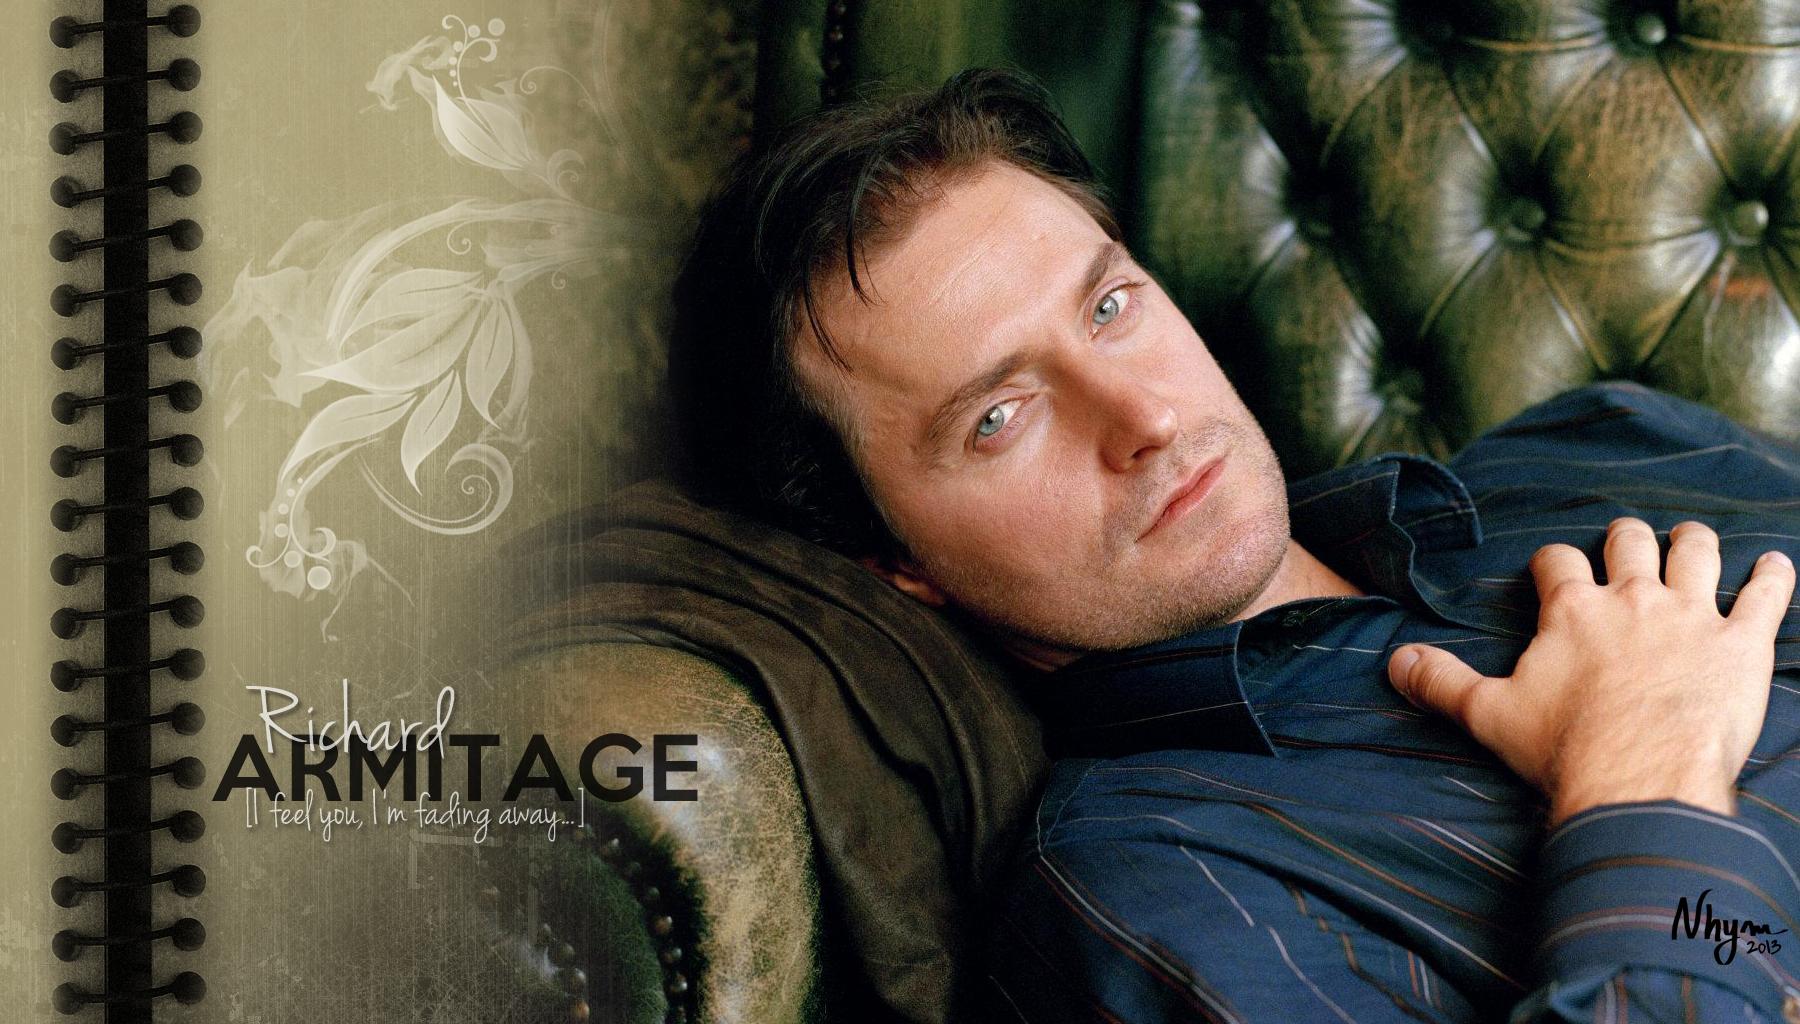 Richard Armitage Wallpaper   Richard Armitage Photo 33483133 1800x1024